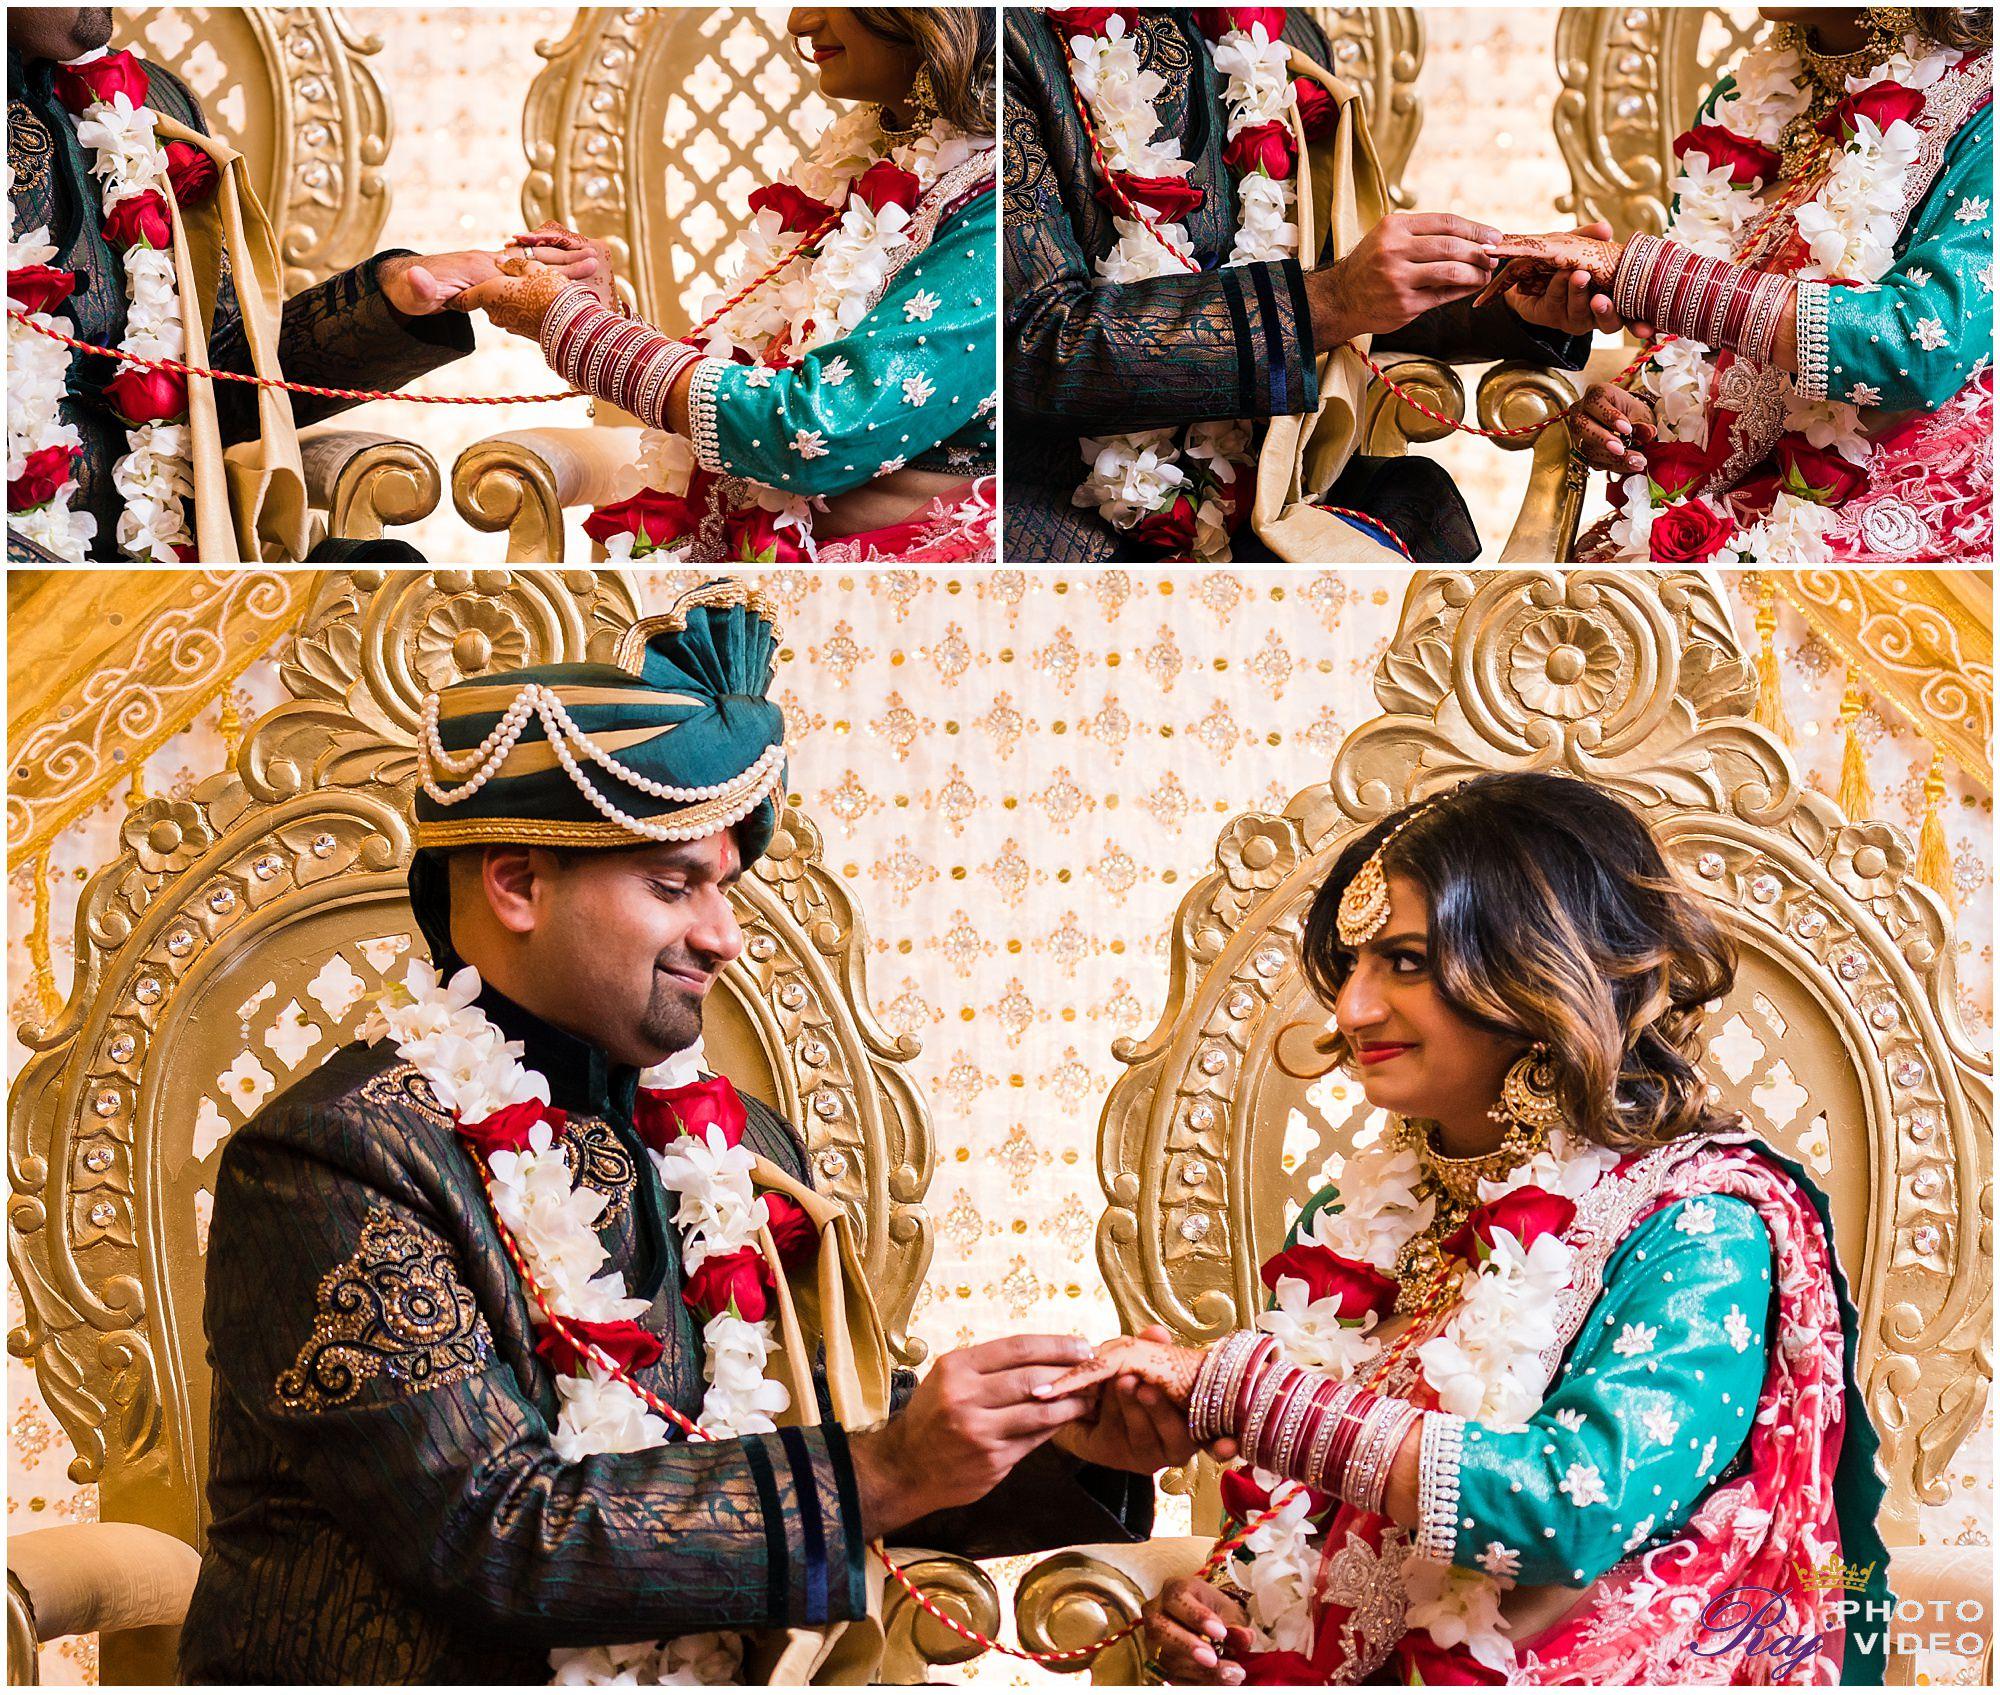 Sri-Guruvaayoorappan-Temple-Marlboro-NJ-Indian-Wedding-Chiyomi-Scott-00025.jpg